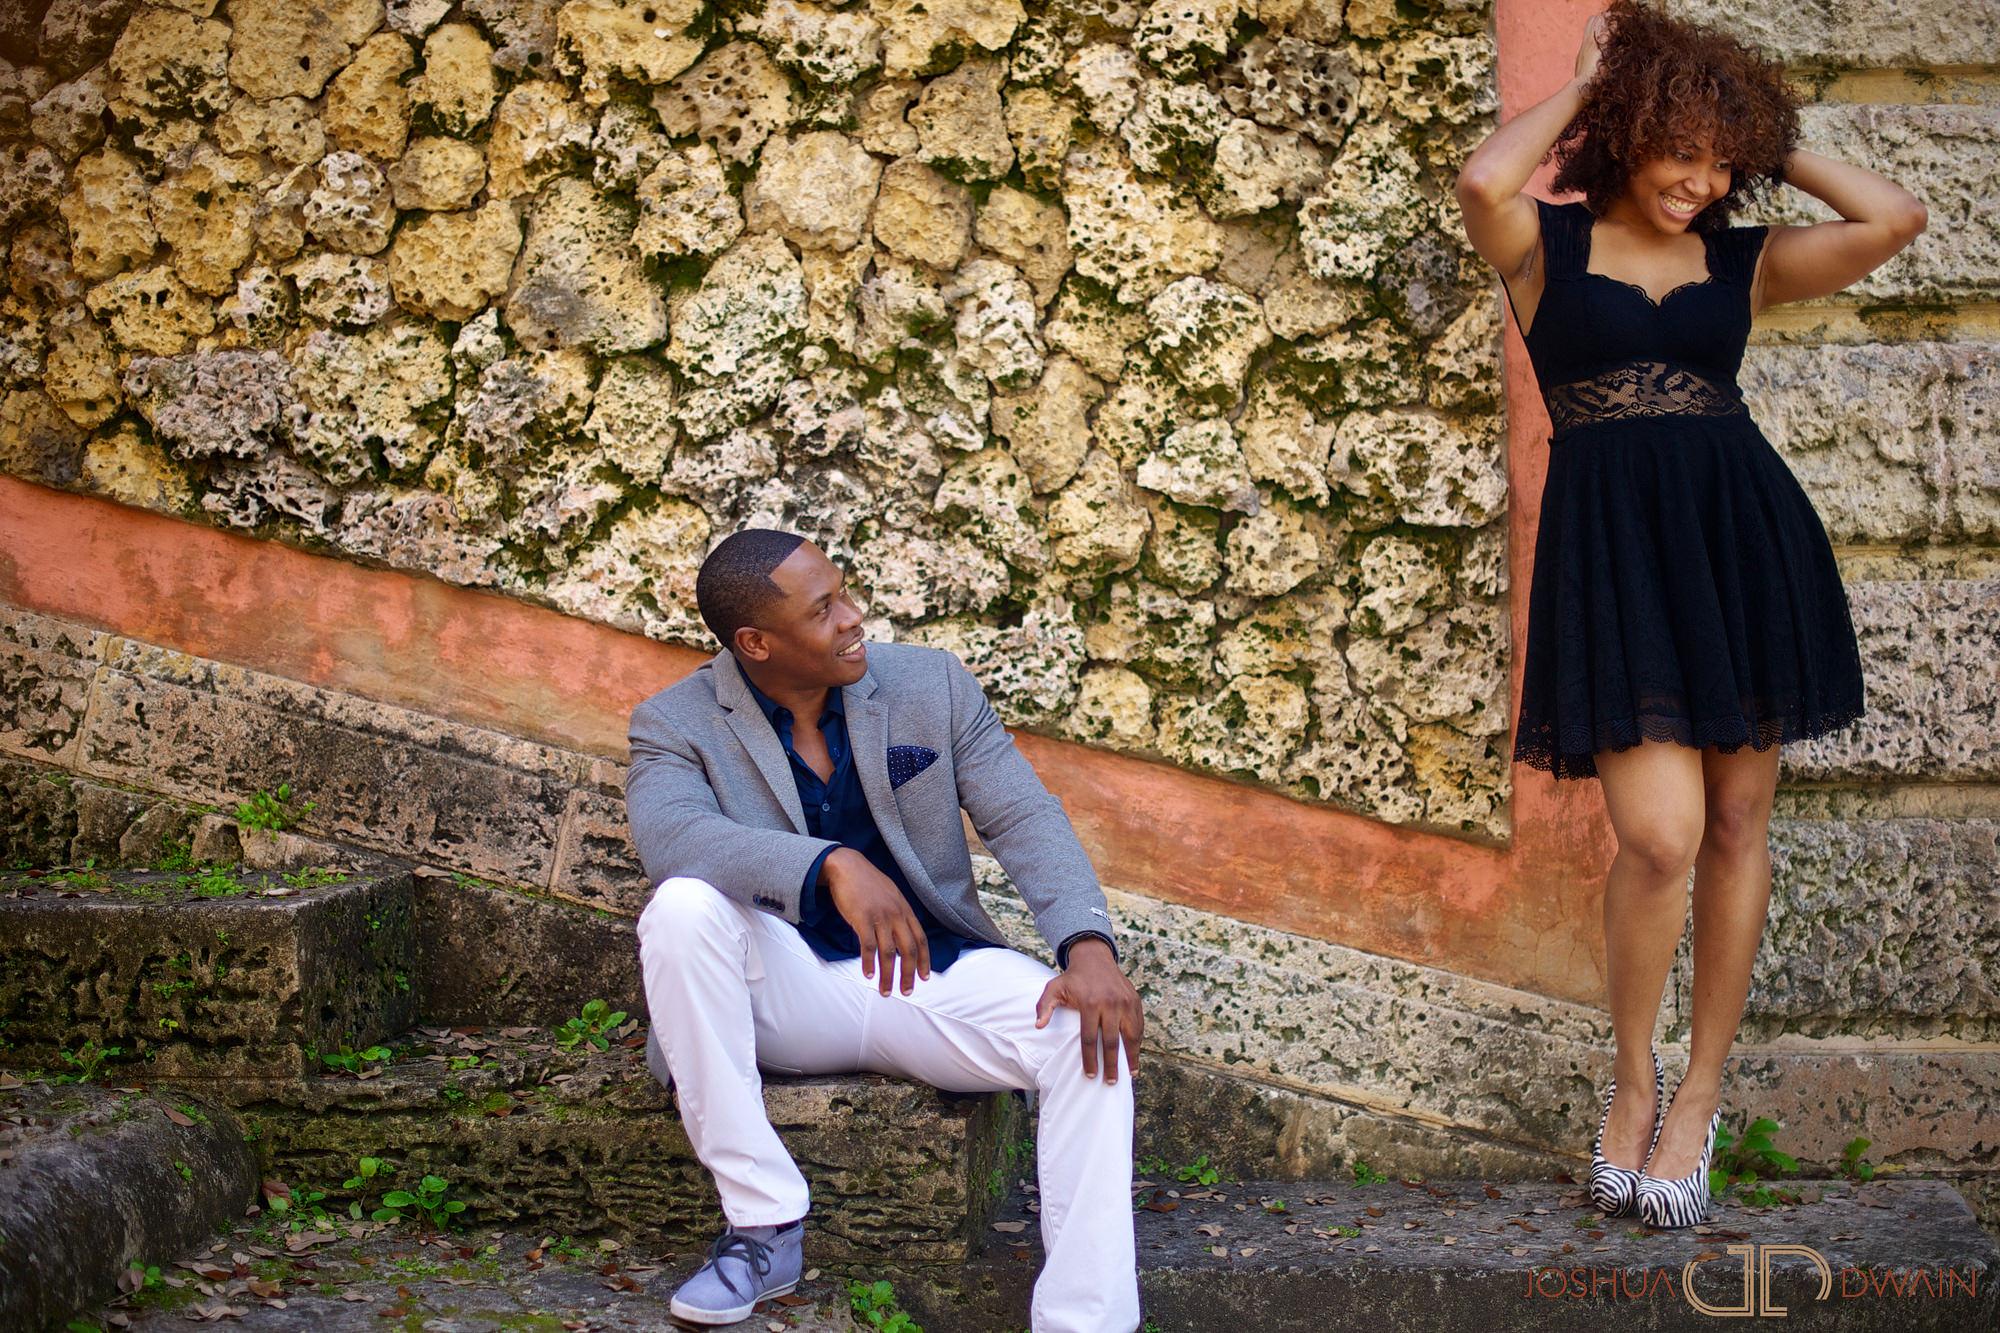 danielle-dowani-006-vizcaya-museum-gardens-miami-florida-wedding-photographer-joshua-dwain